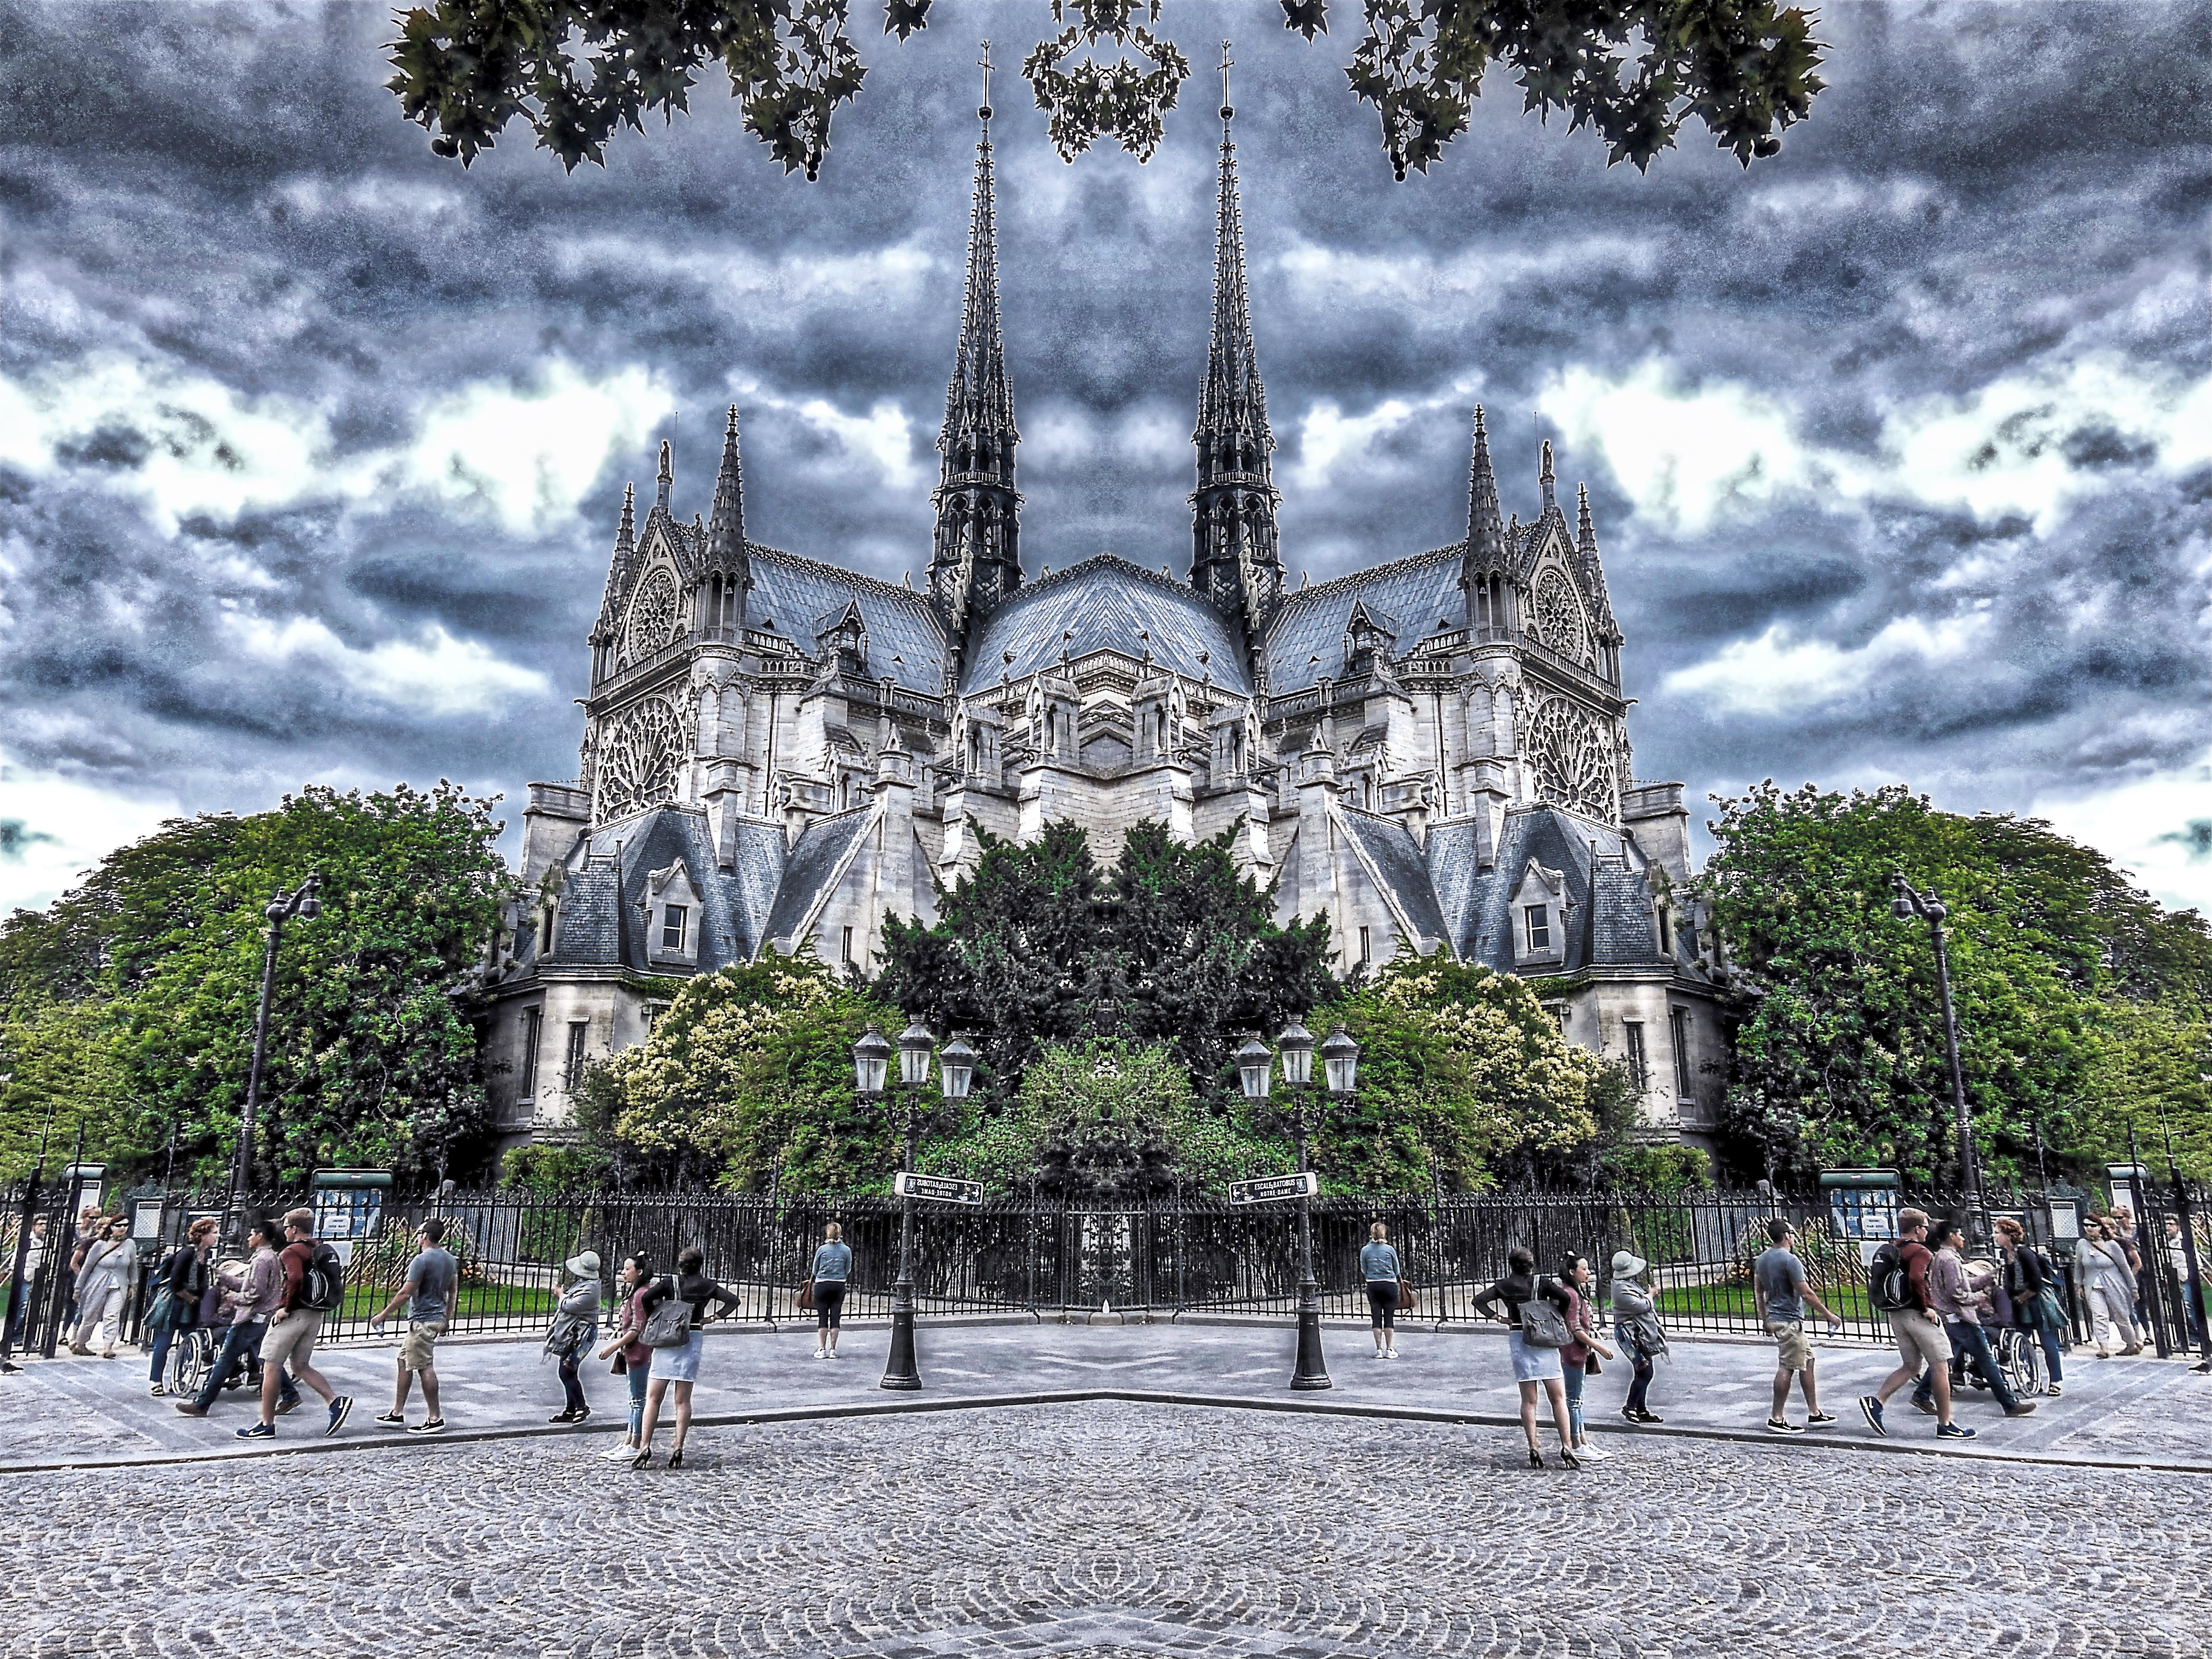 Notre Dame reflejada